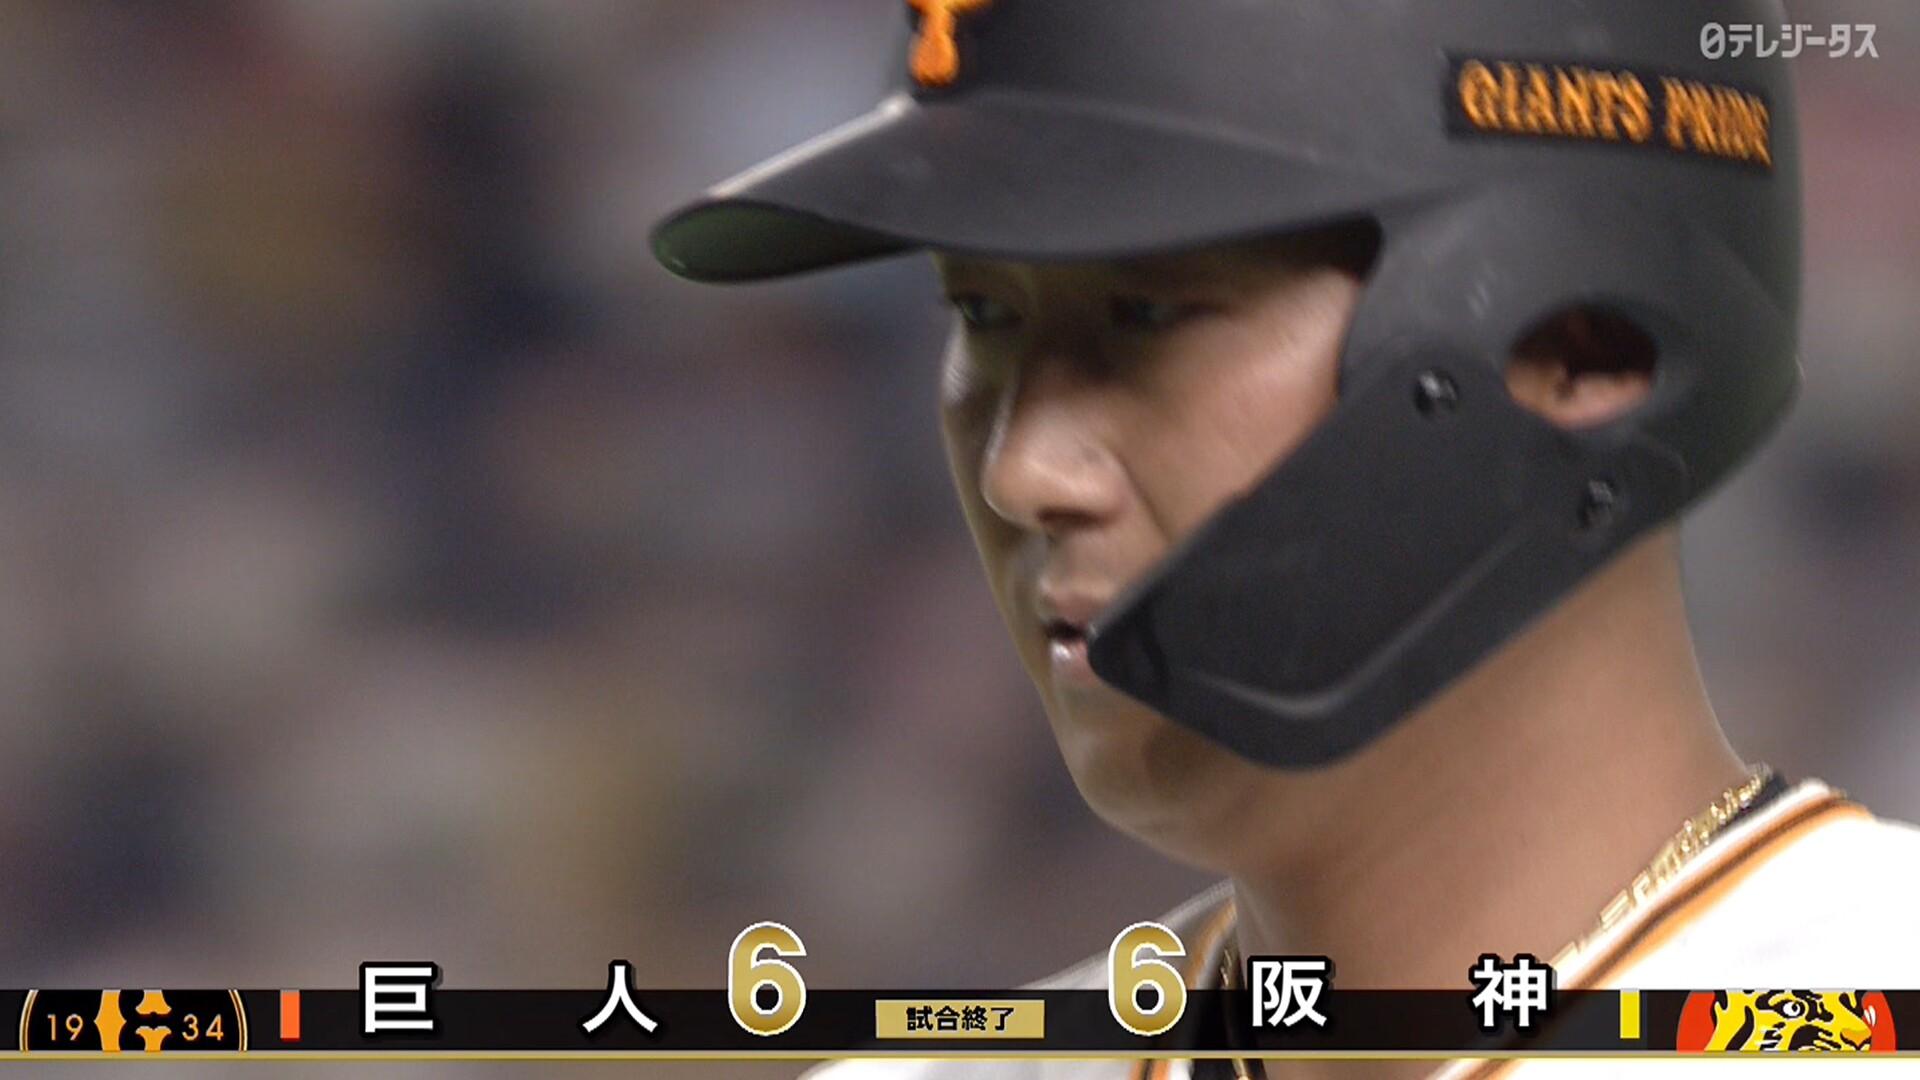 中田翔の打球しょぼwwwwwww